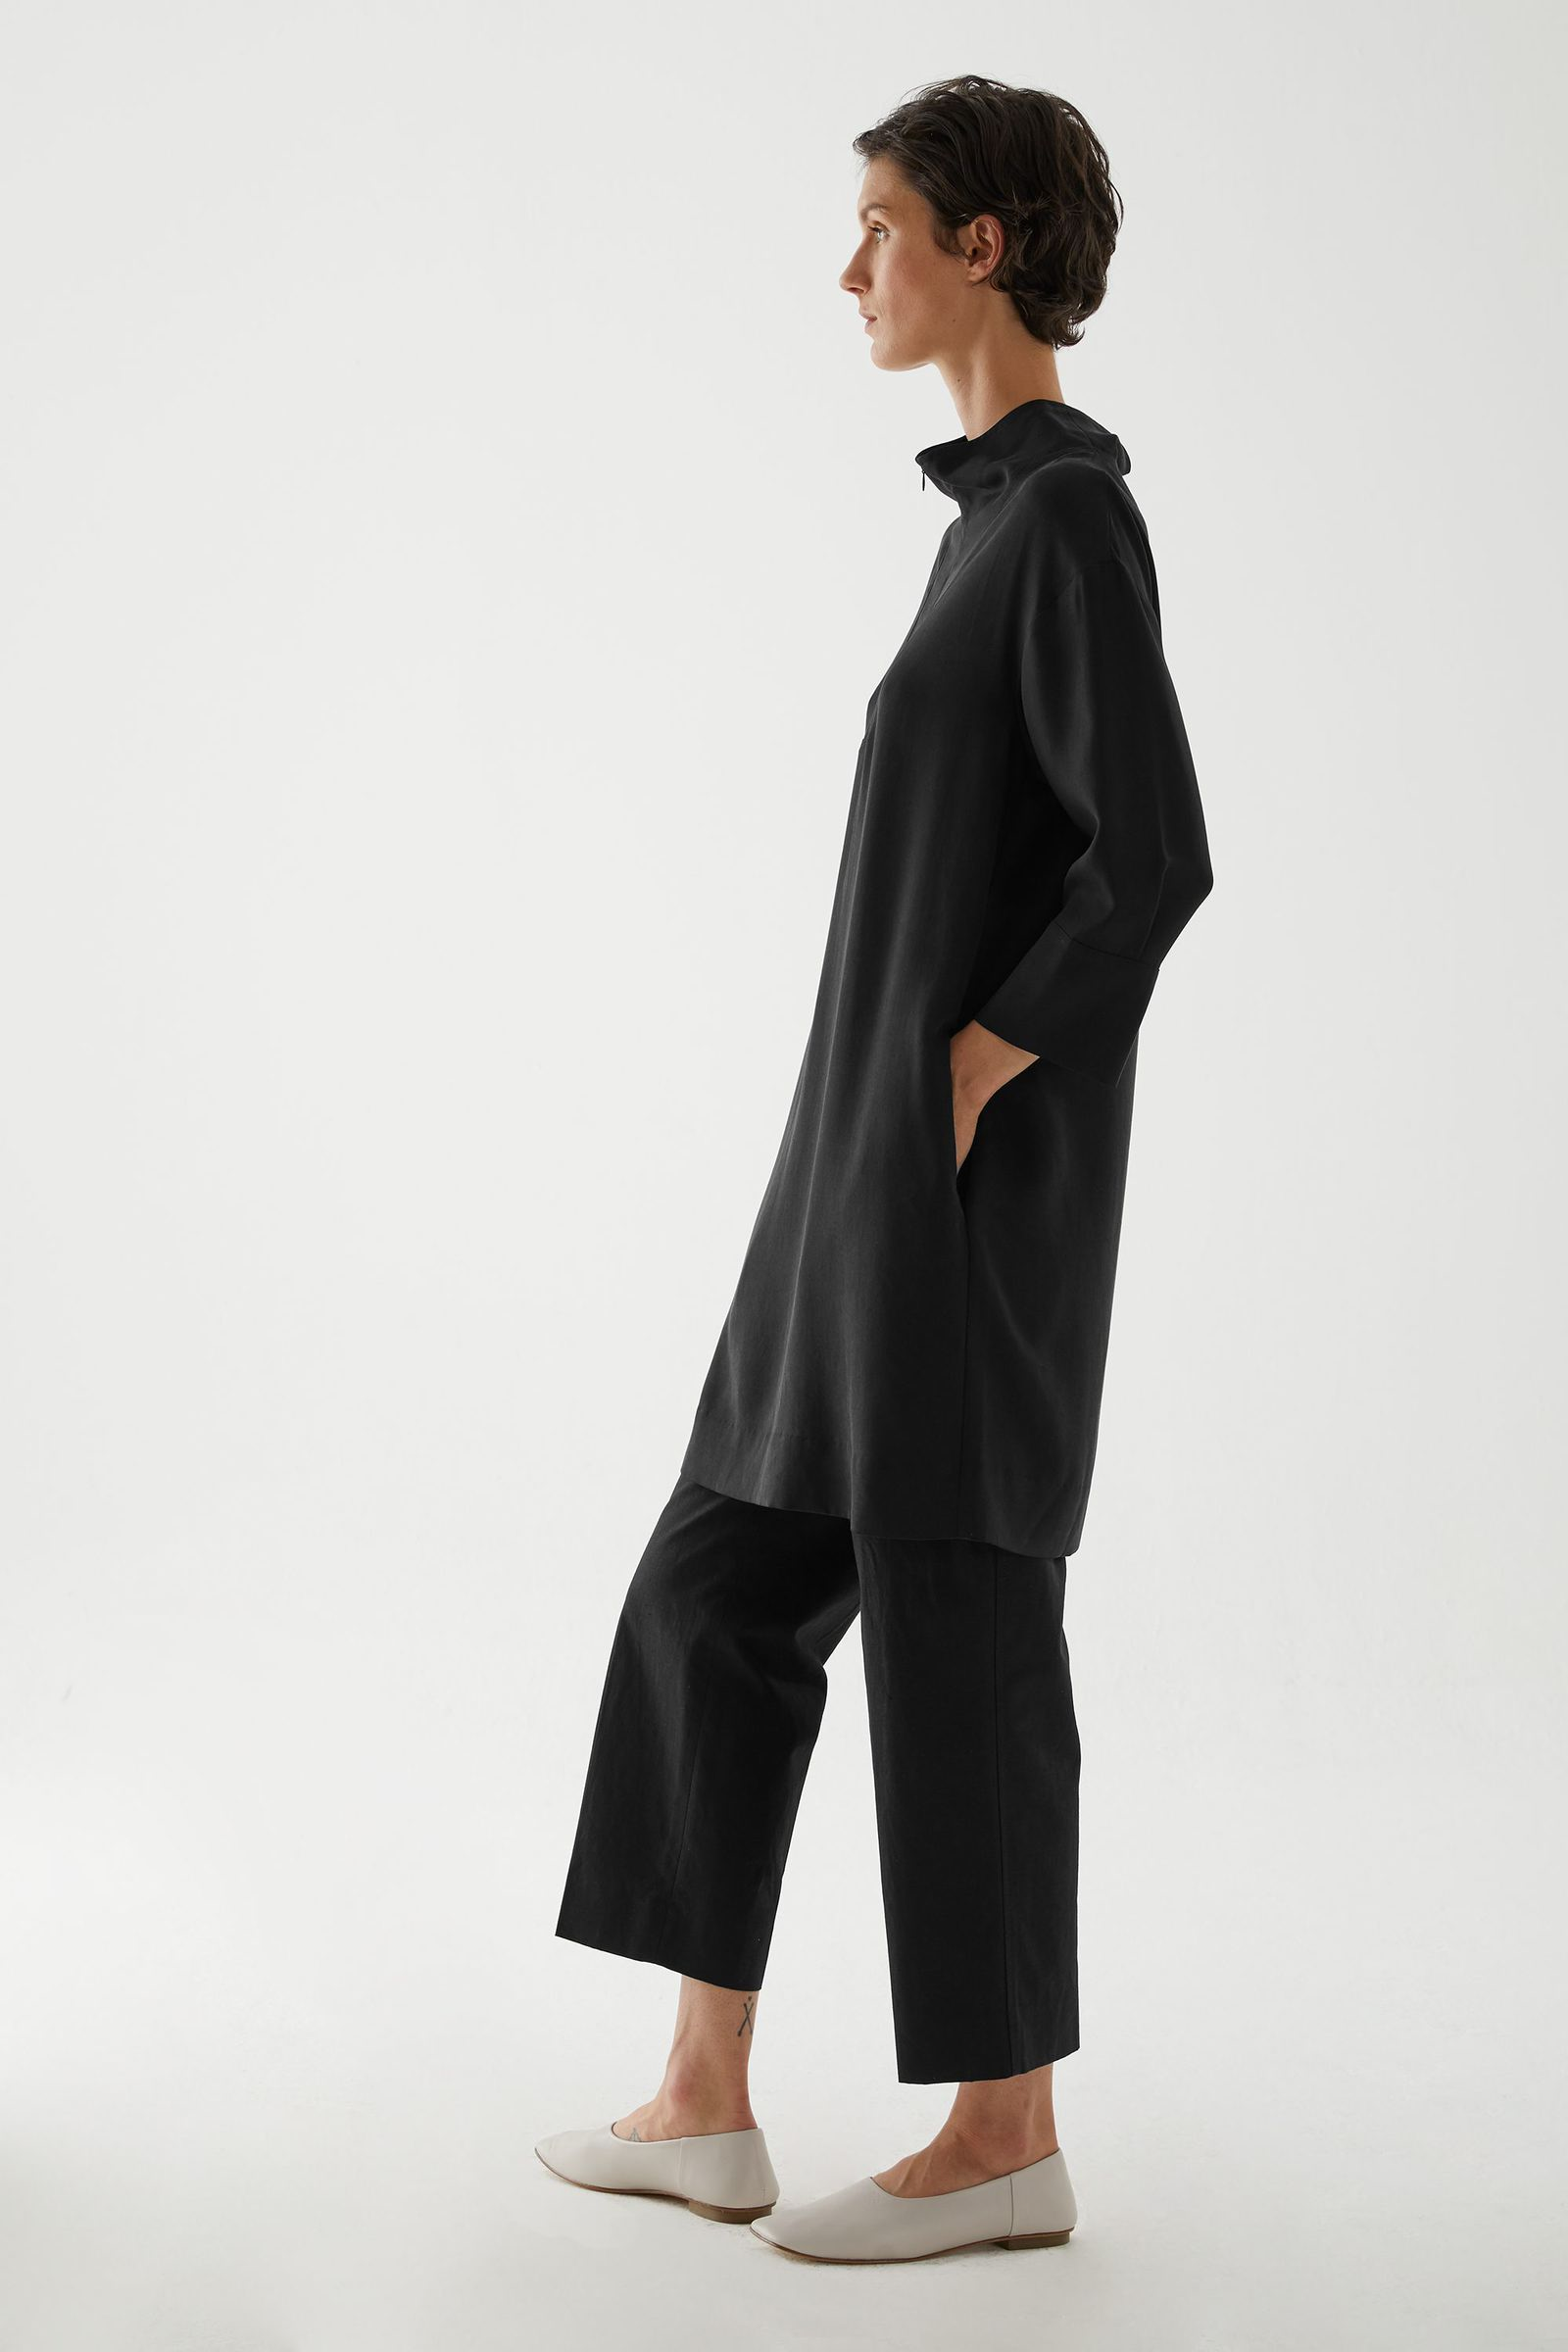 COS 라이오셀 유틸리티 드레스의 블랙컬러 ECOMLook입니다.